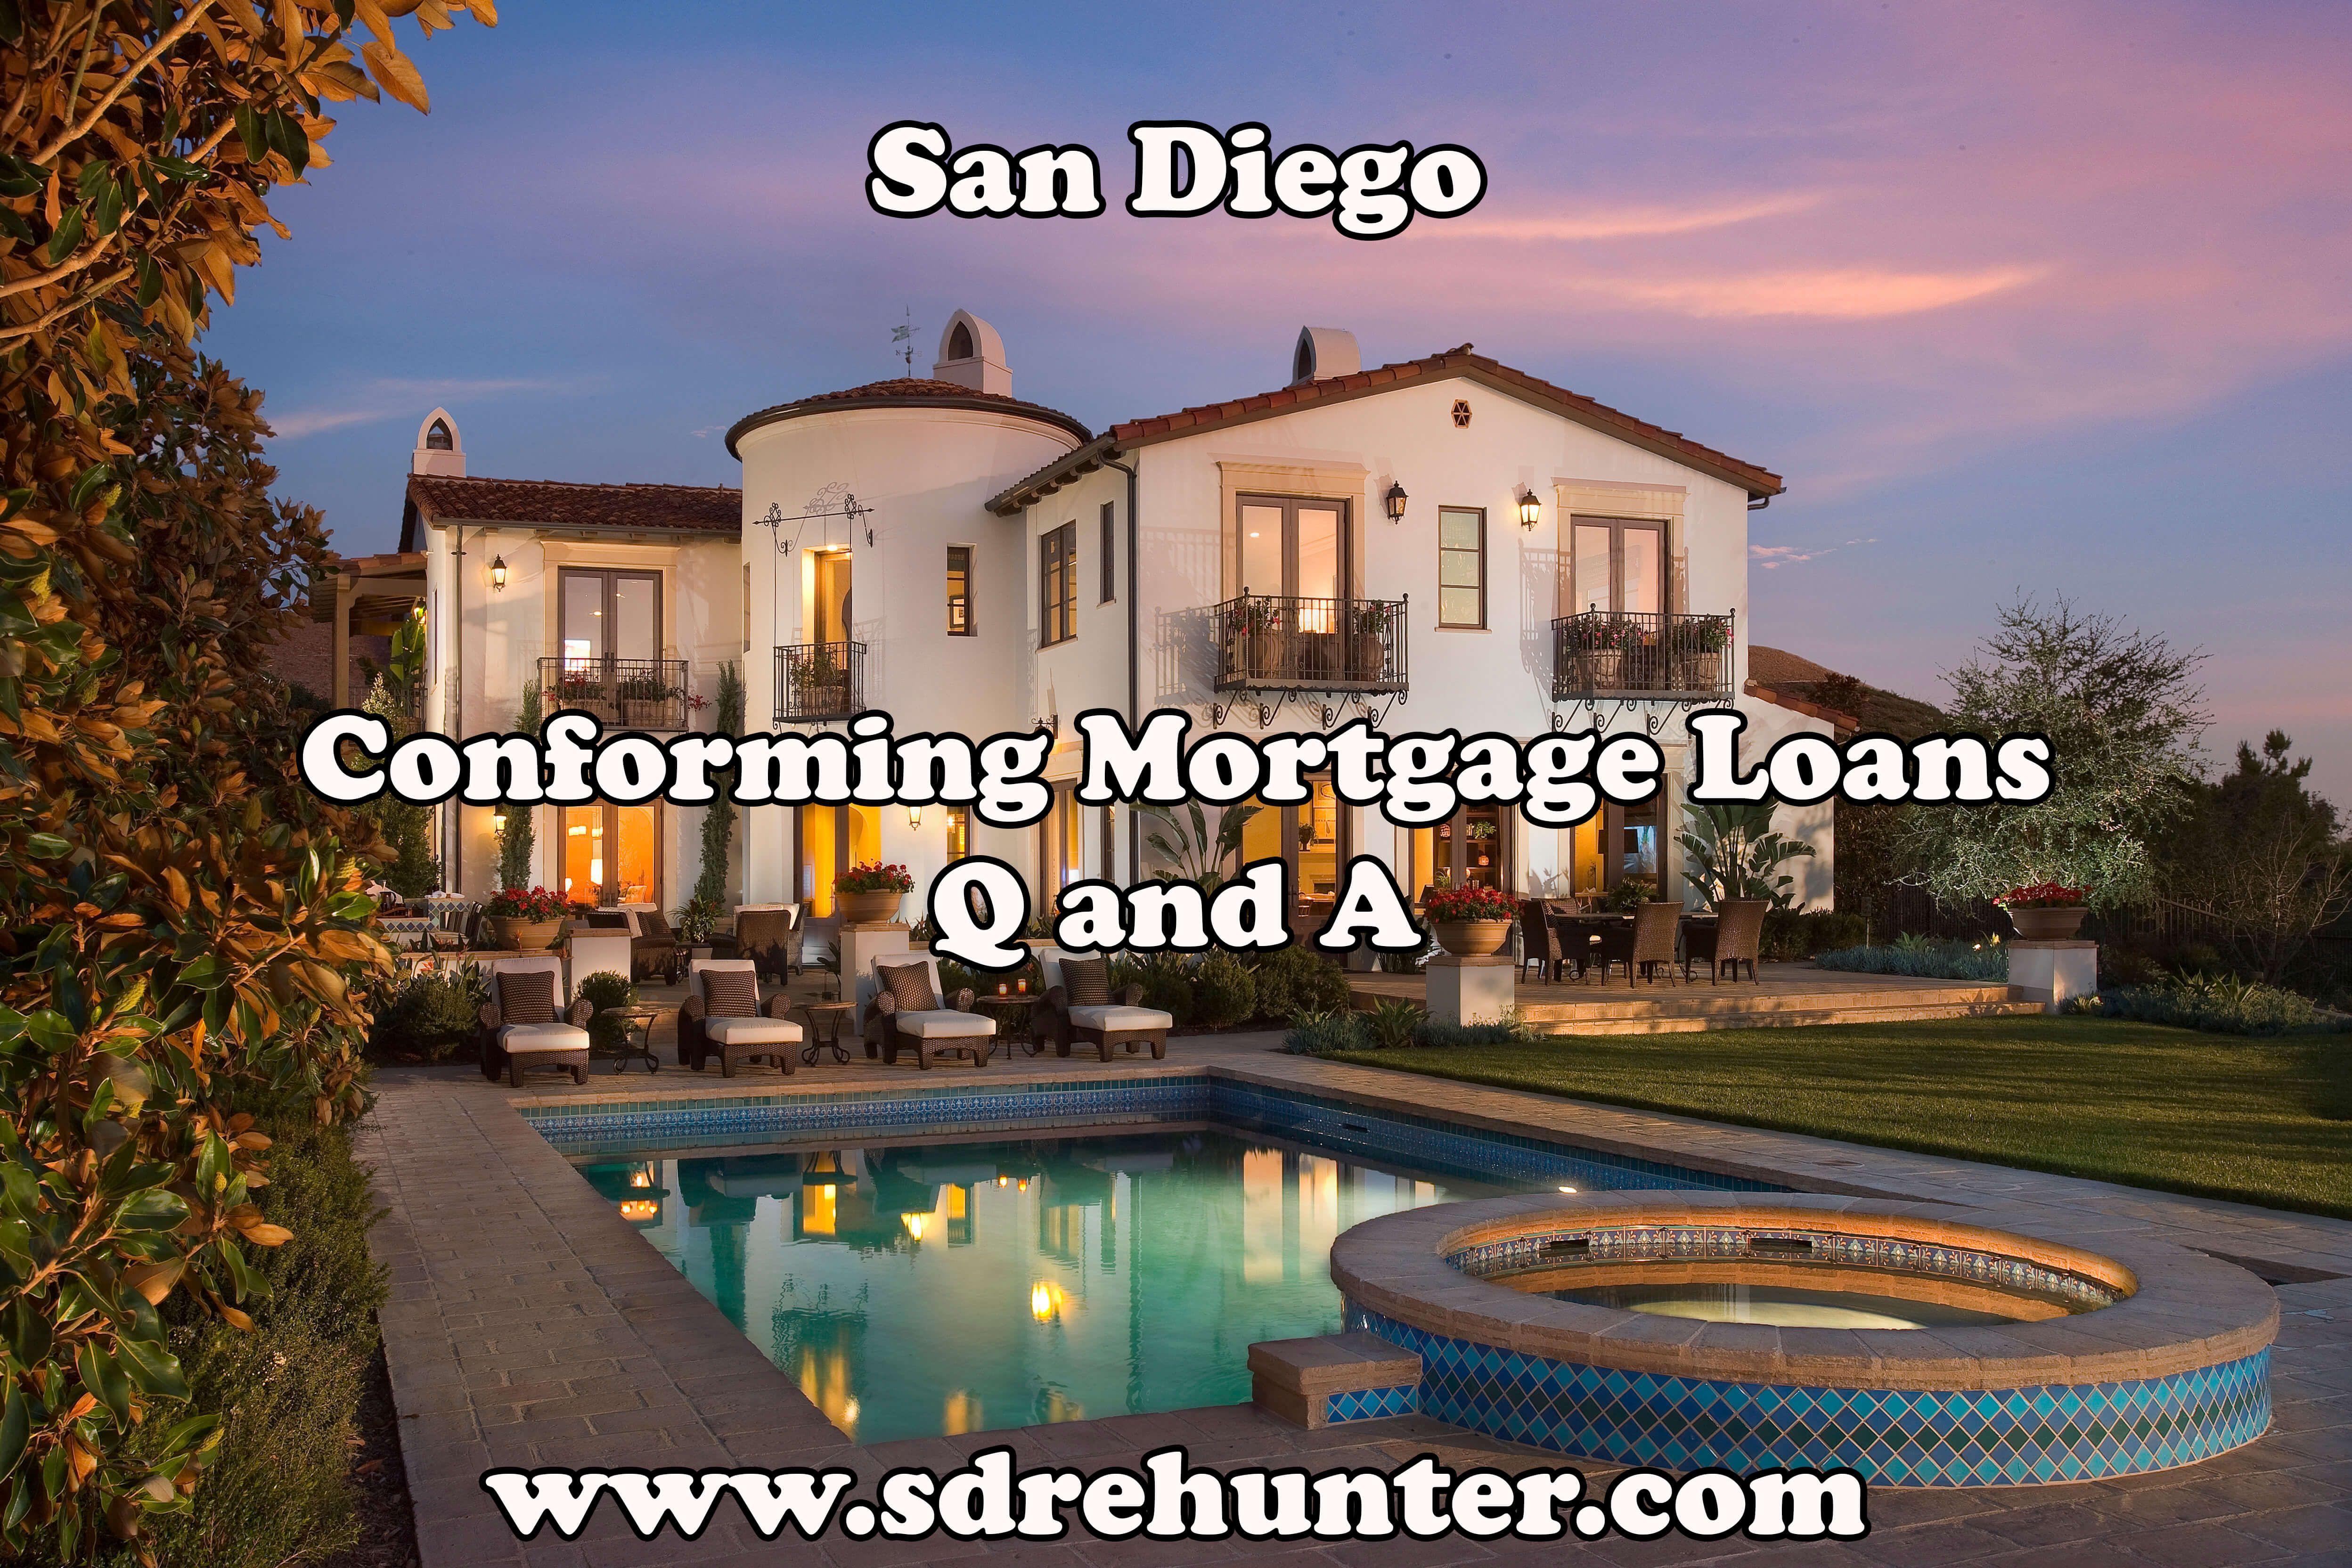 San Diego Conforming Mortgage Loans Q & A 2020 Rental